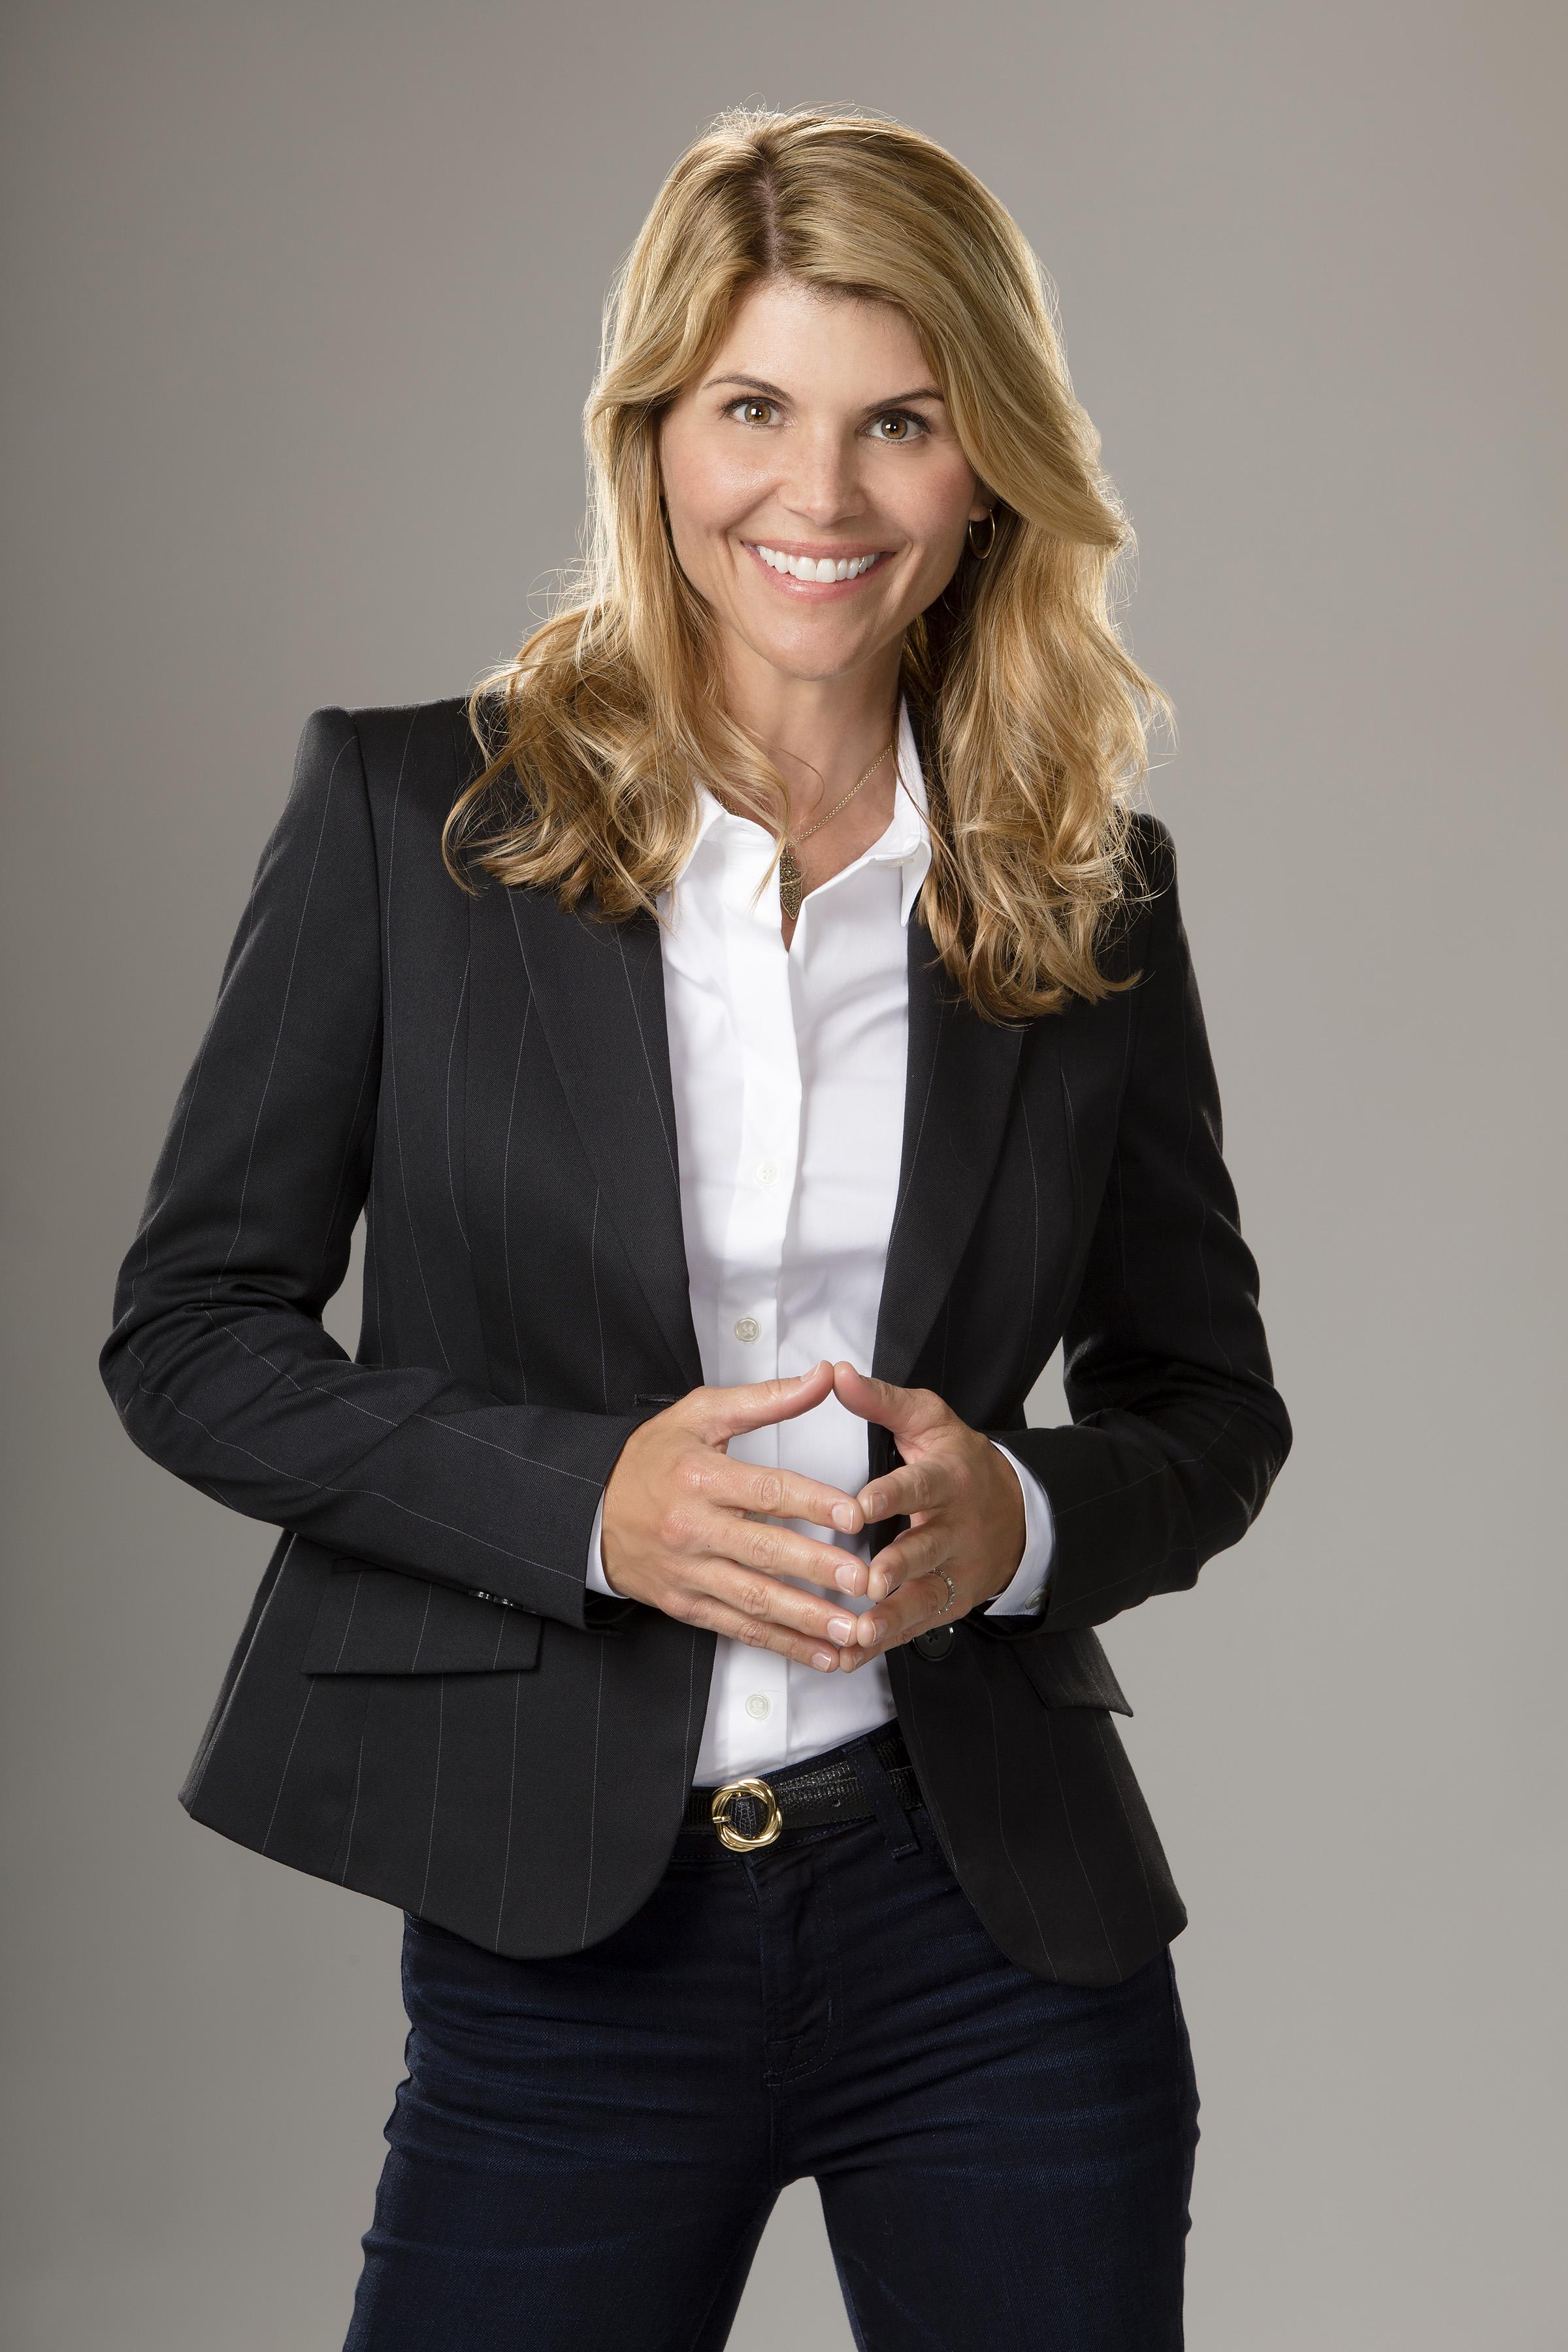 Lori Loughlin Cast Garage Sale Mysteries All That